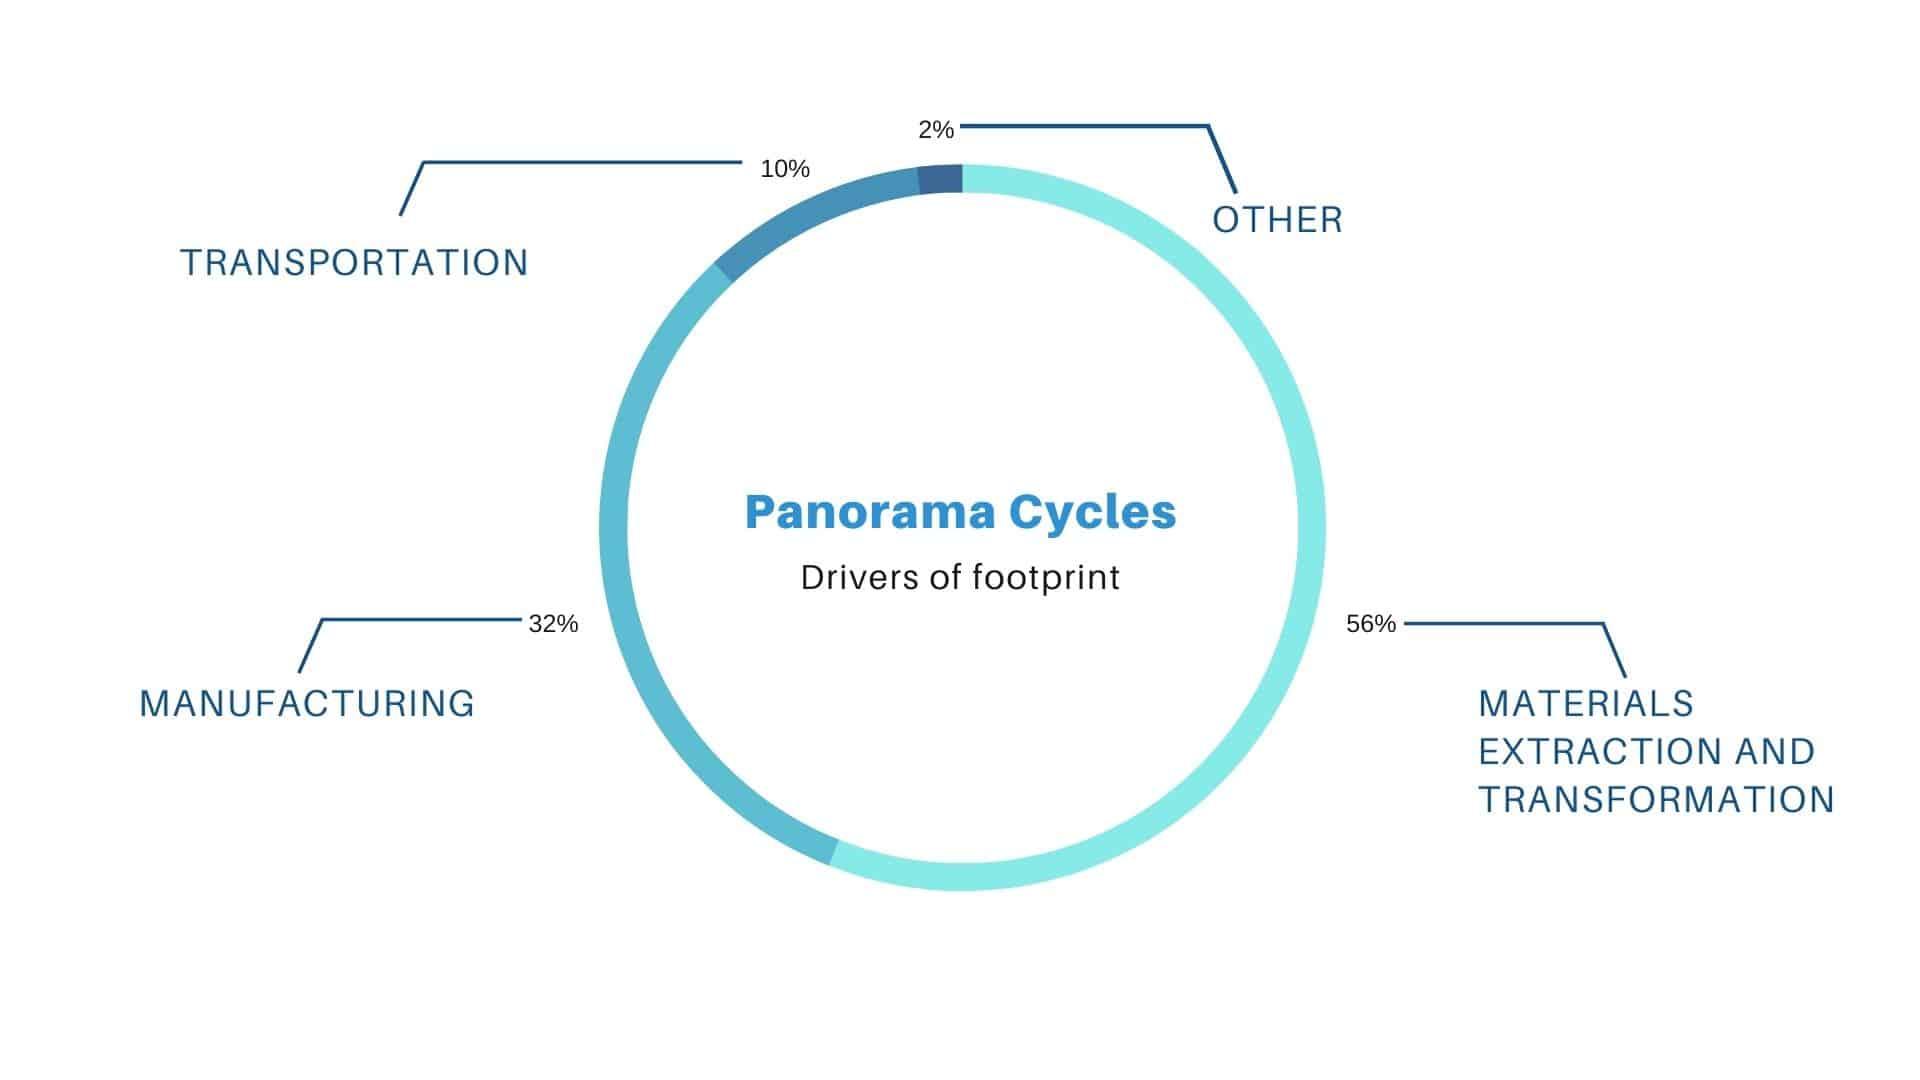 panorama cycles-drivers footprint